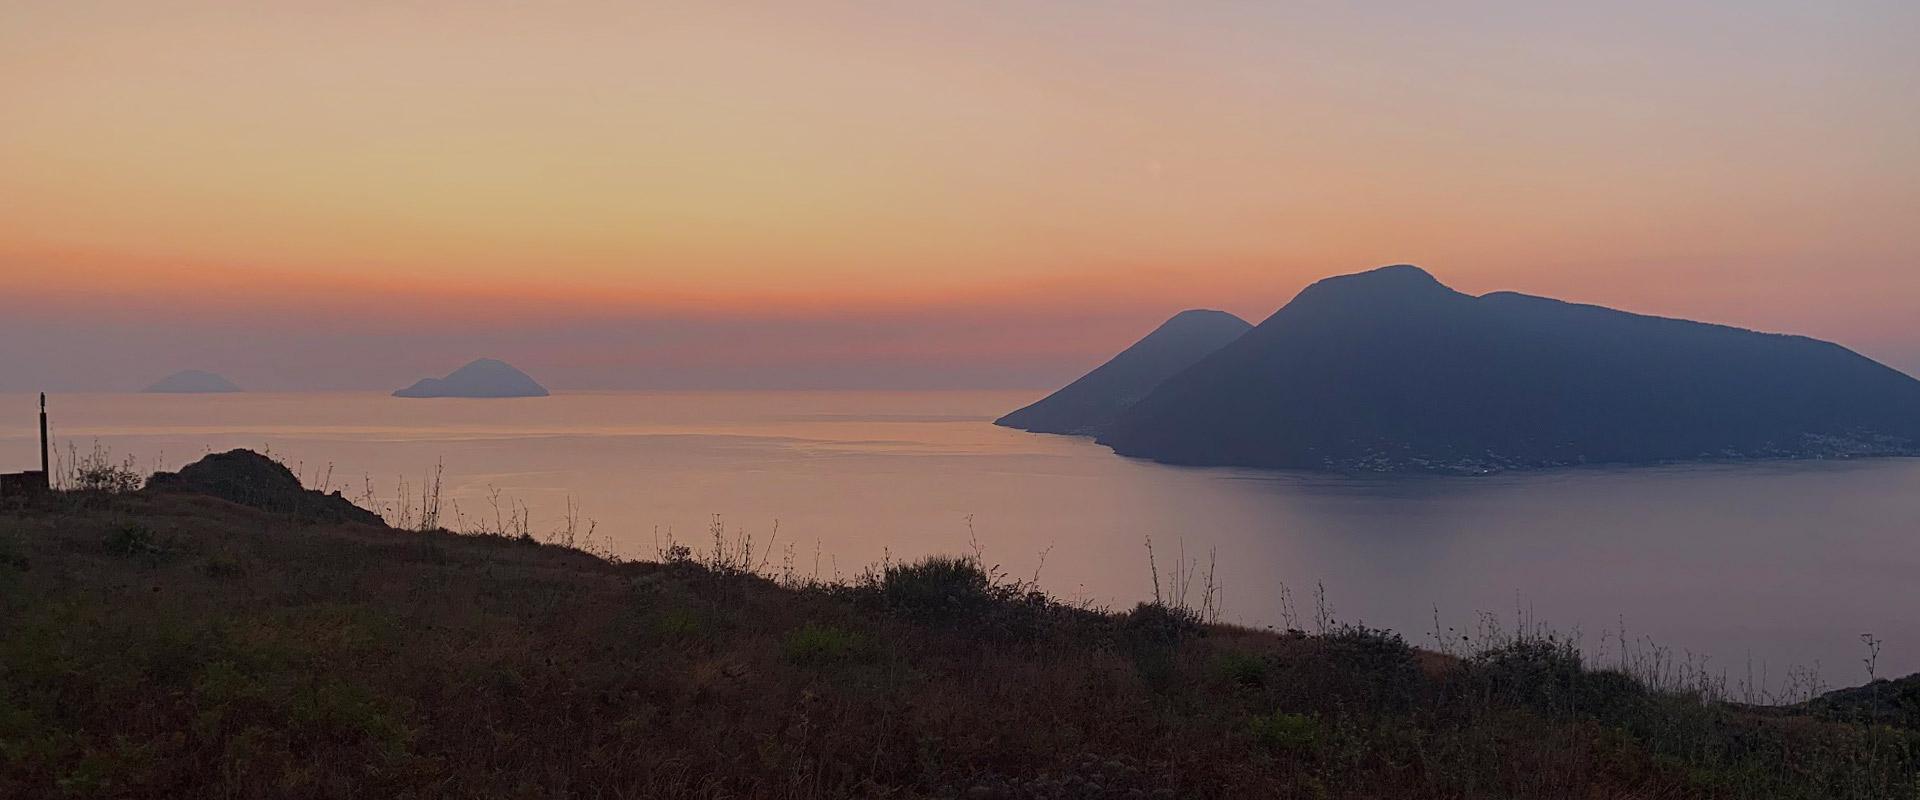 Isole Eolie sunset